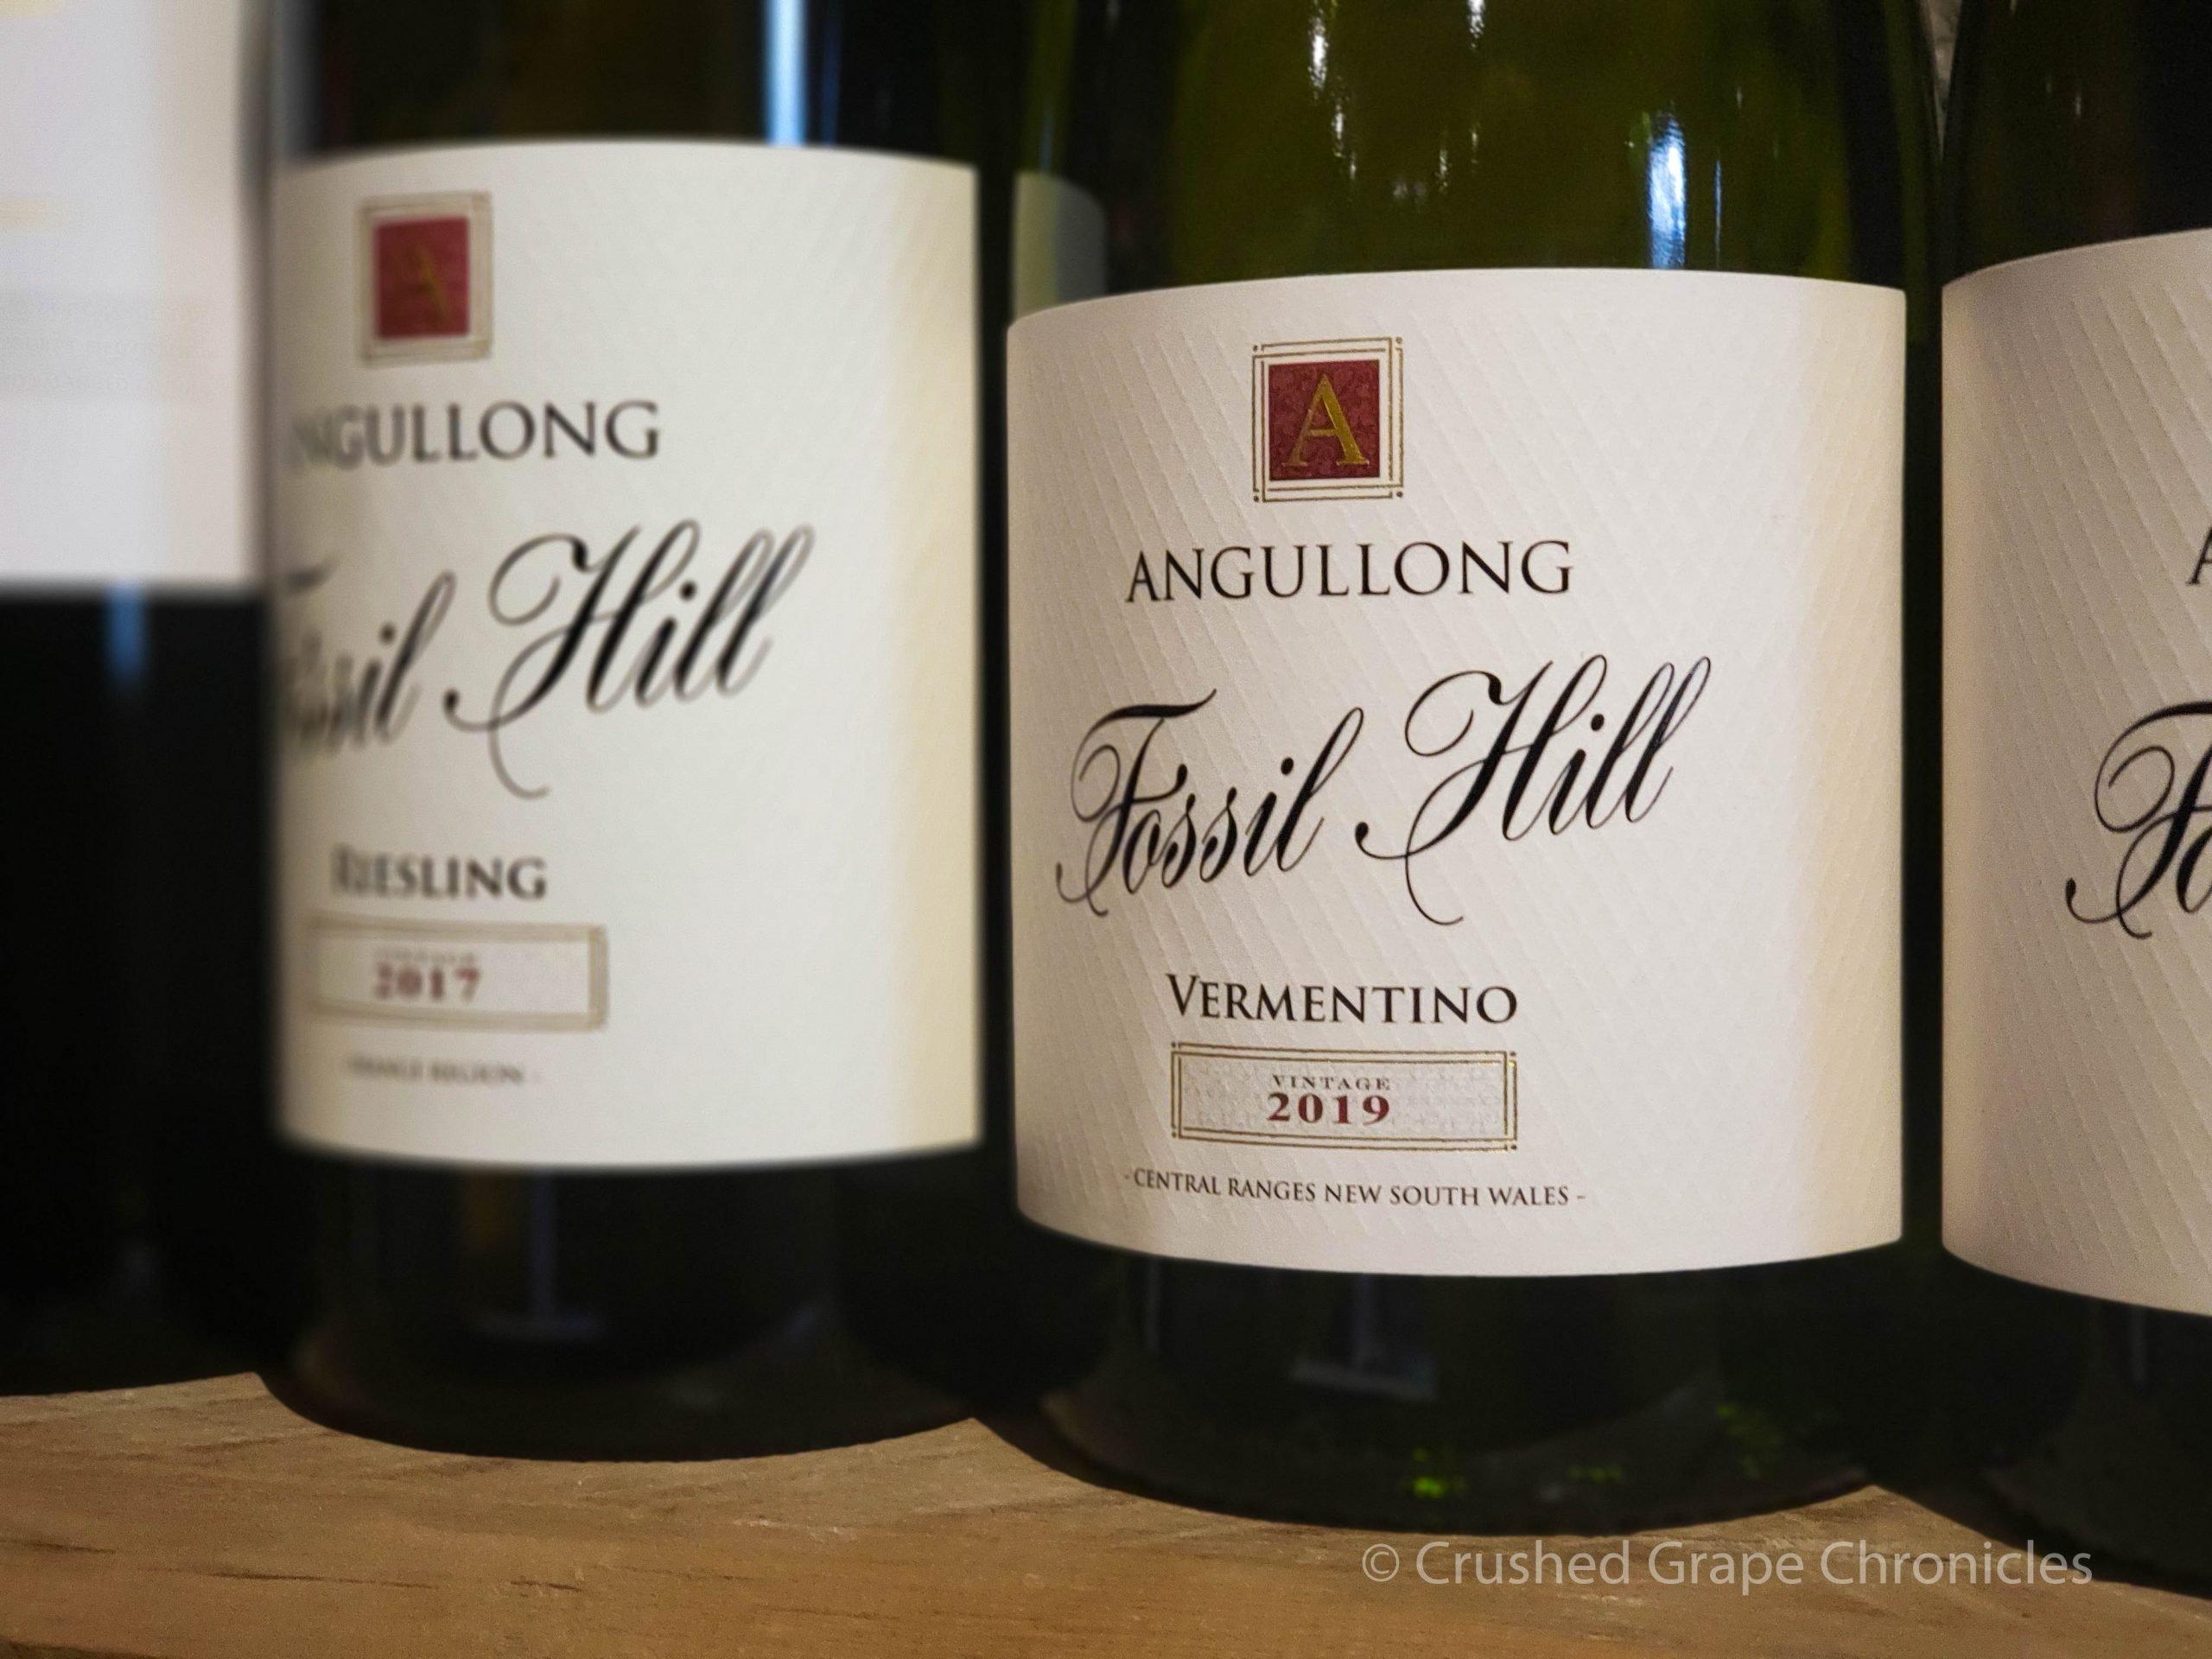 Angullong 2019 Vermentino at Angullong Vineyard in Cellar Door in Millthorpe, Orange NSW Australia